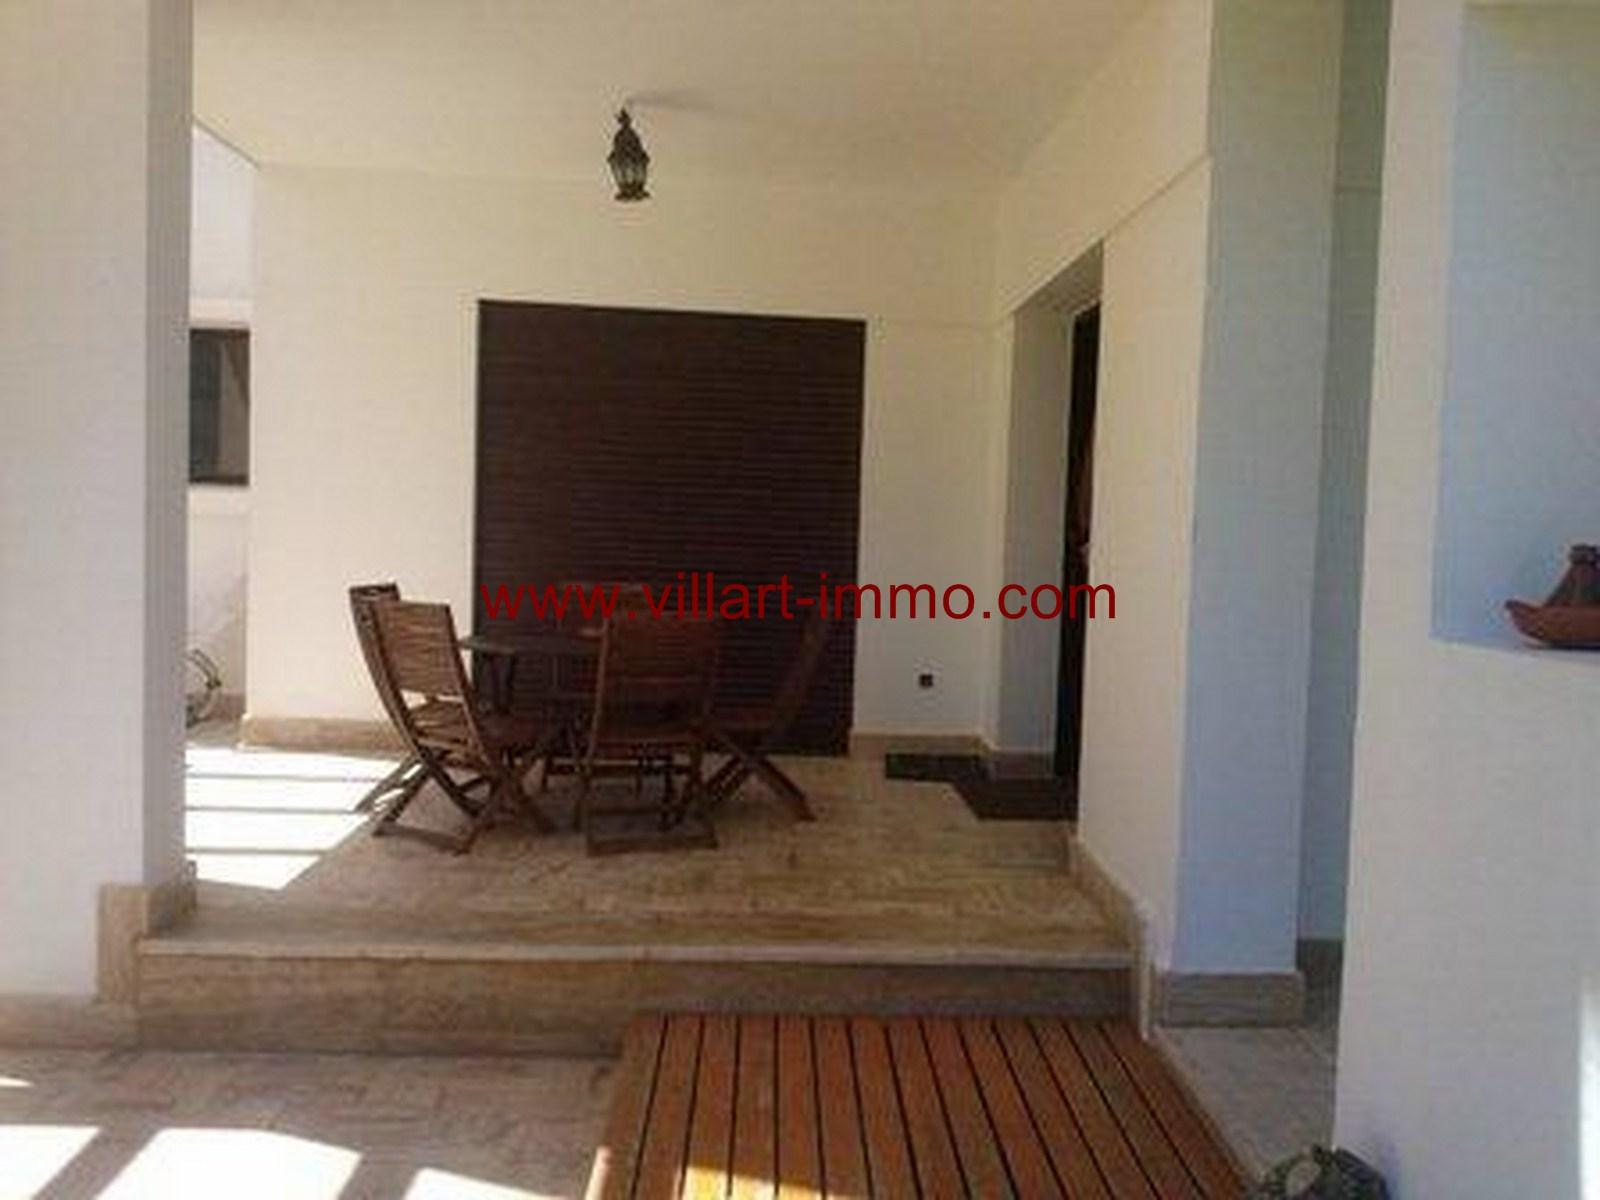 3-vente-appartement-tanger-achakar-terrasse-2-va388-villart-immo